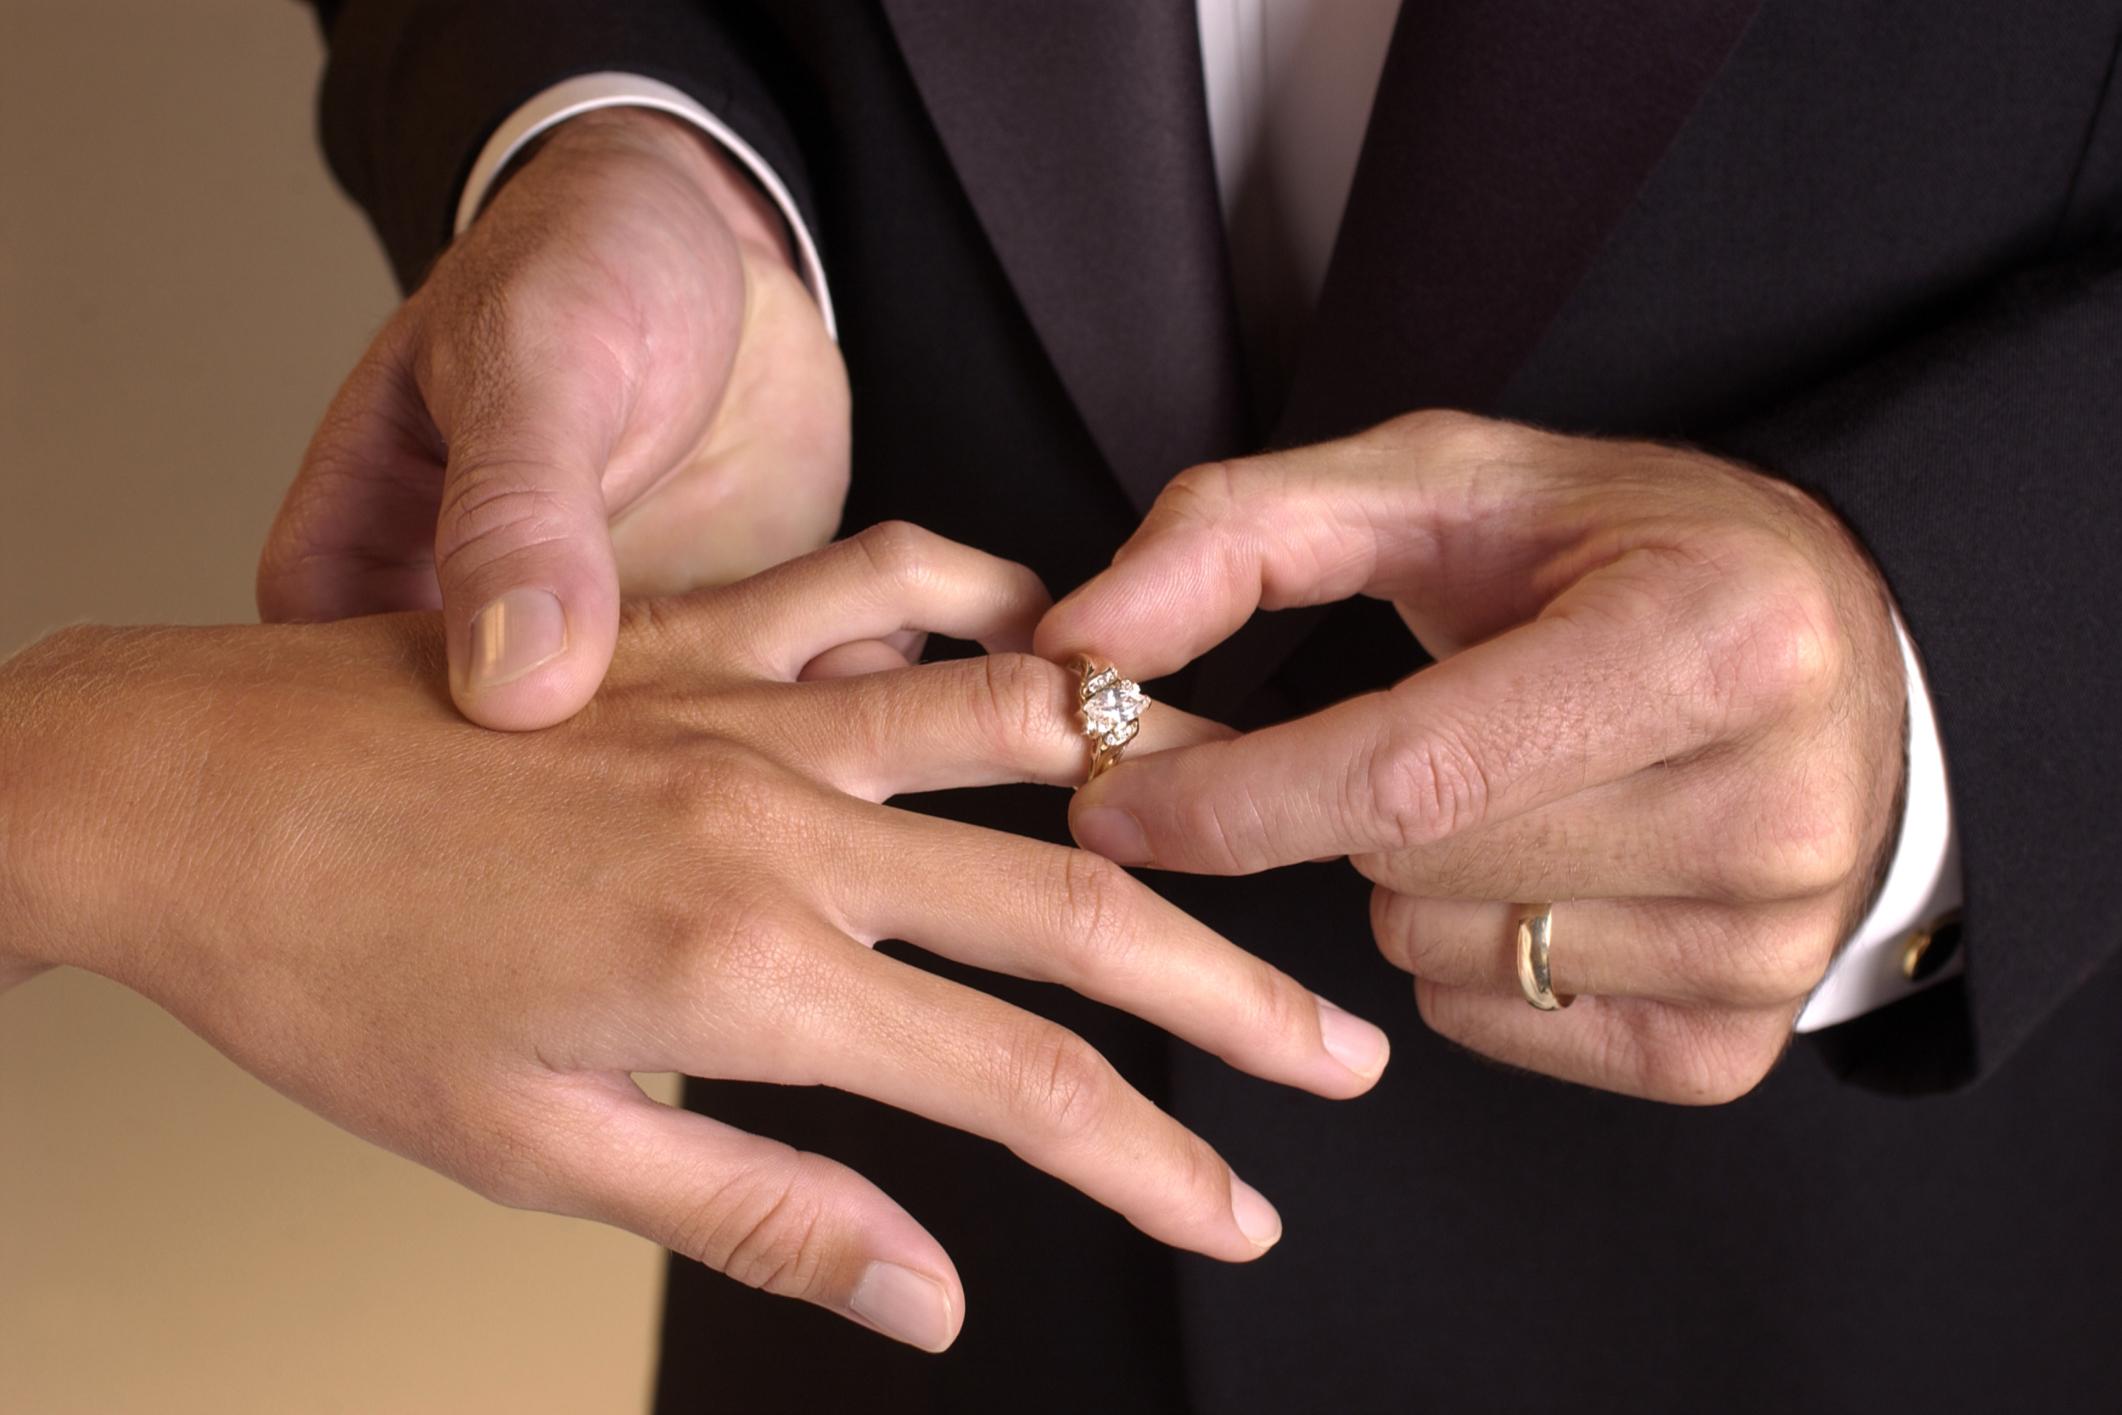 Engagement rings and wedding rings Articles Easy Weddings